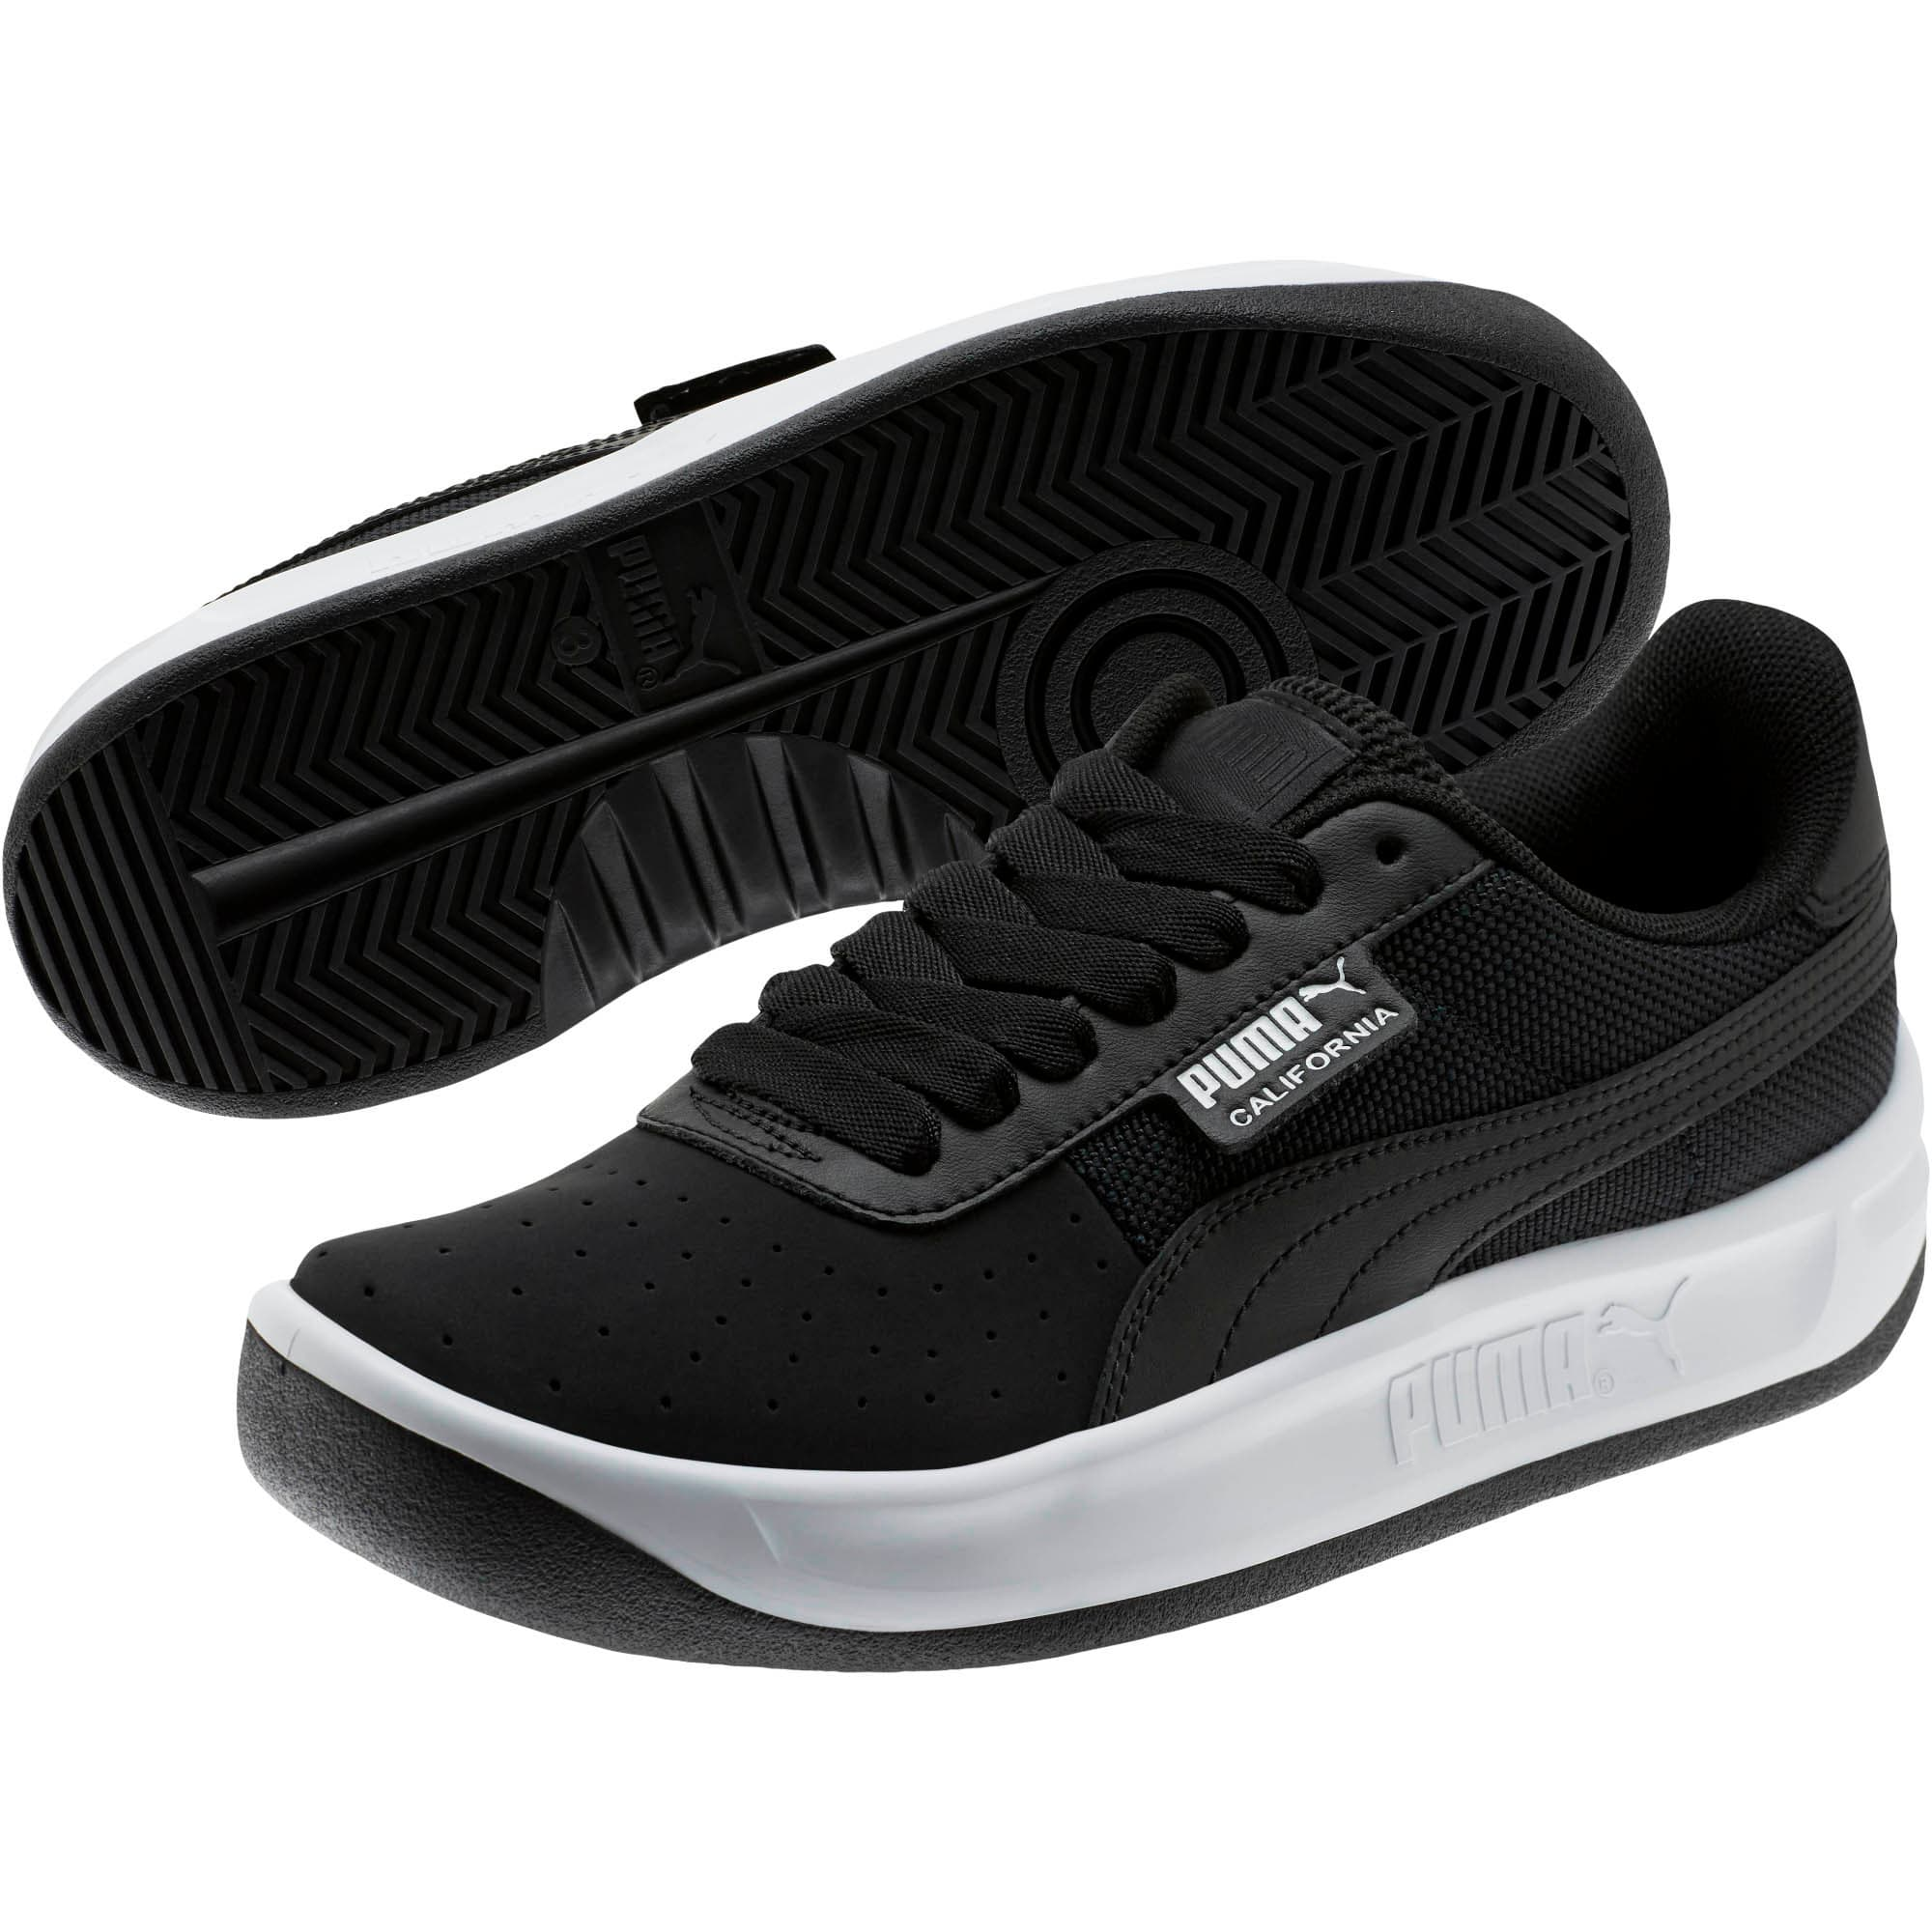 Thumbnail 2 of California Sneakers JR, P Black-P White-P Black, medium